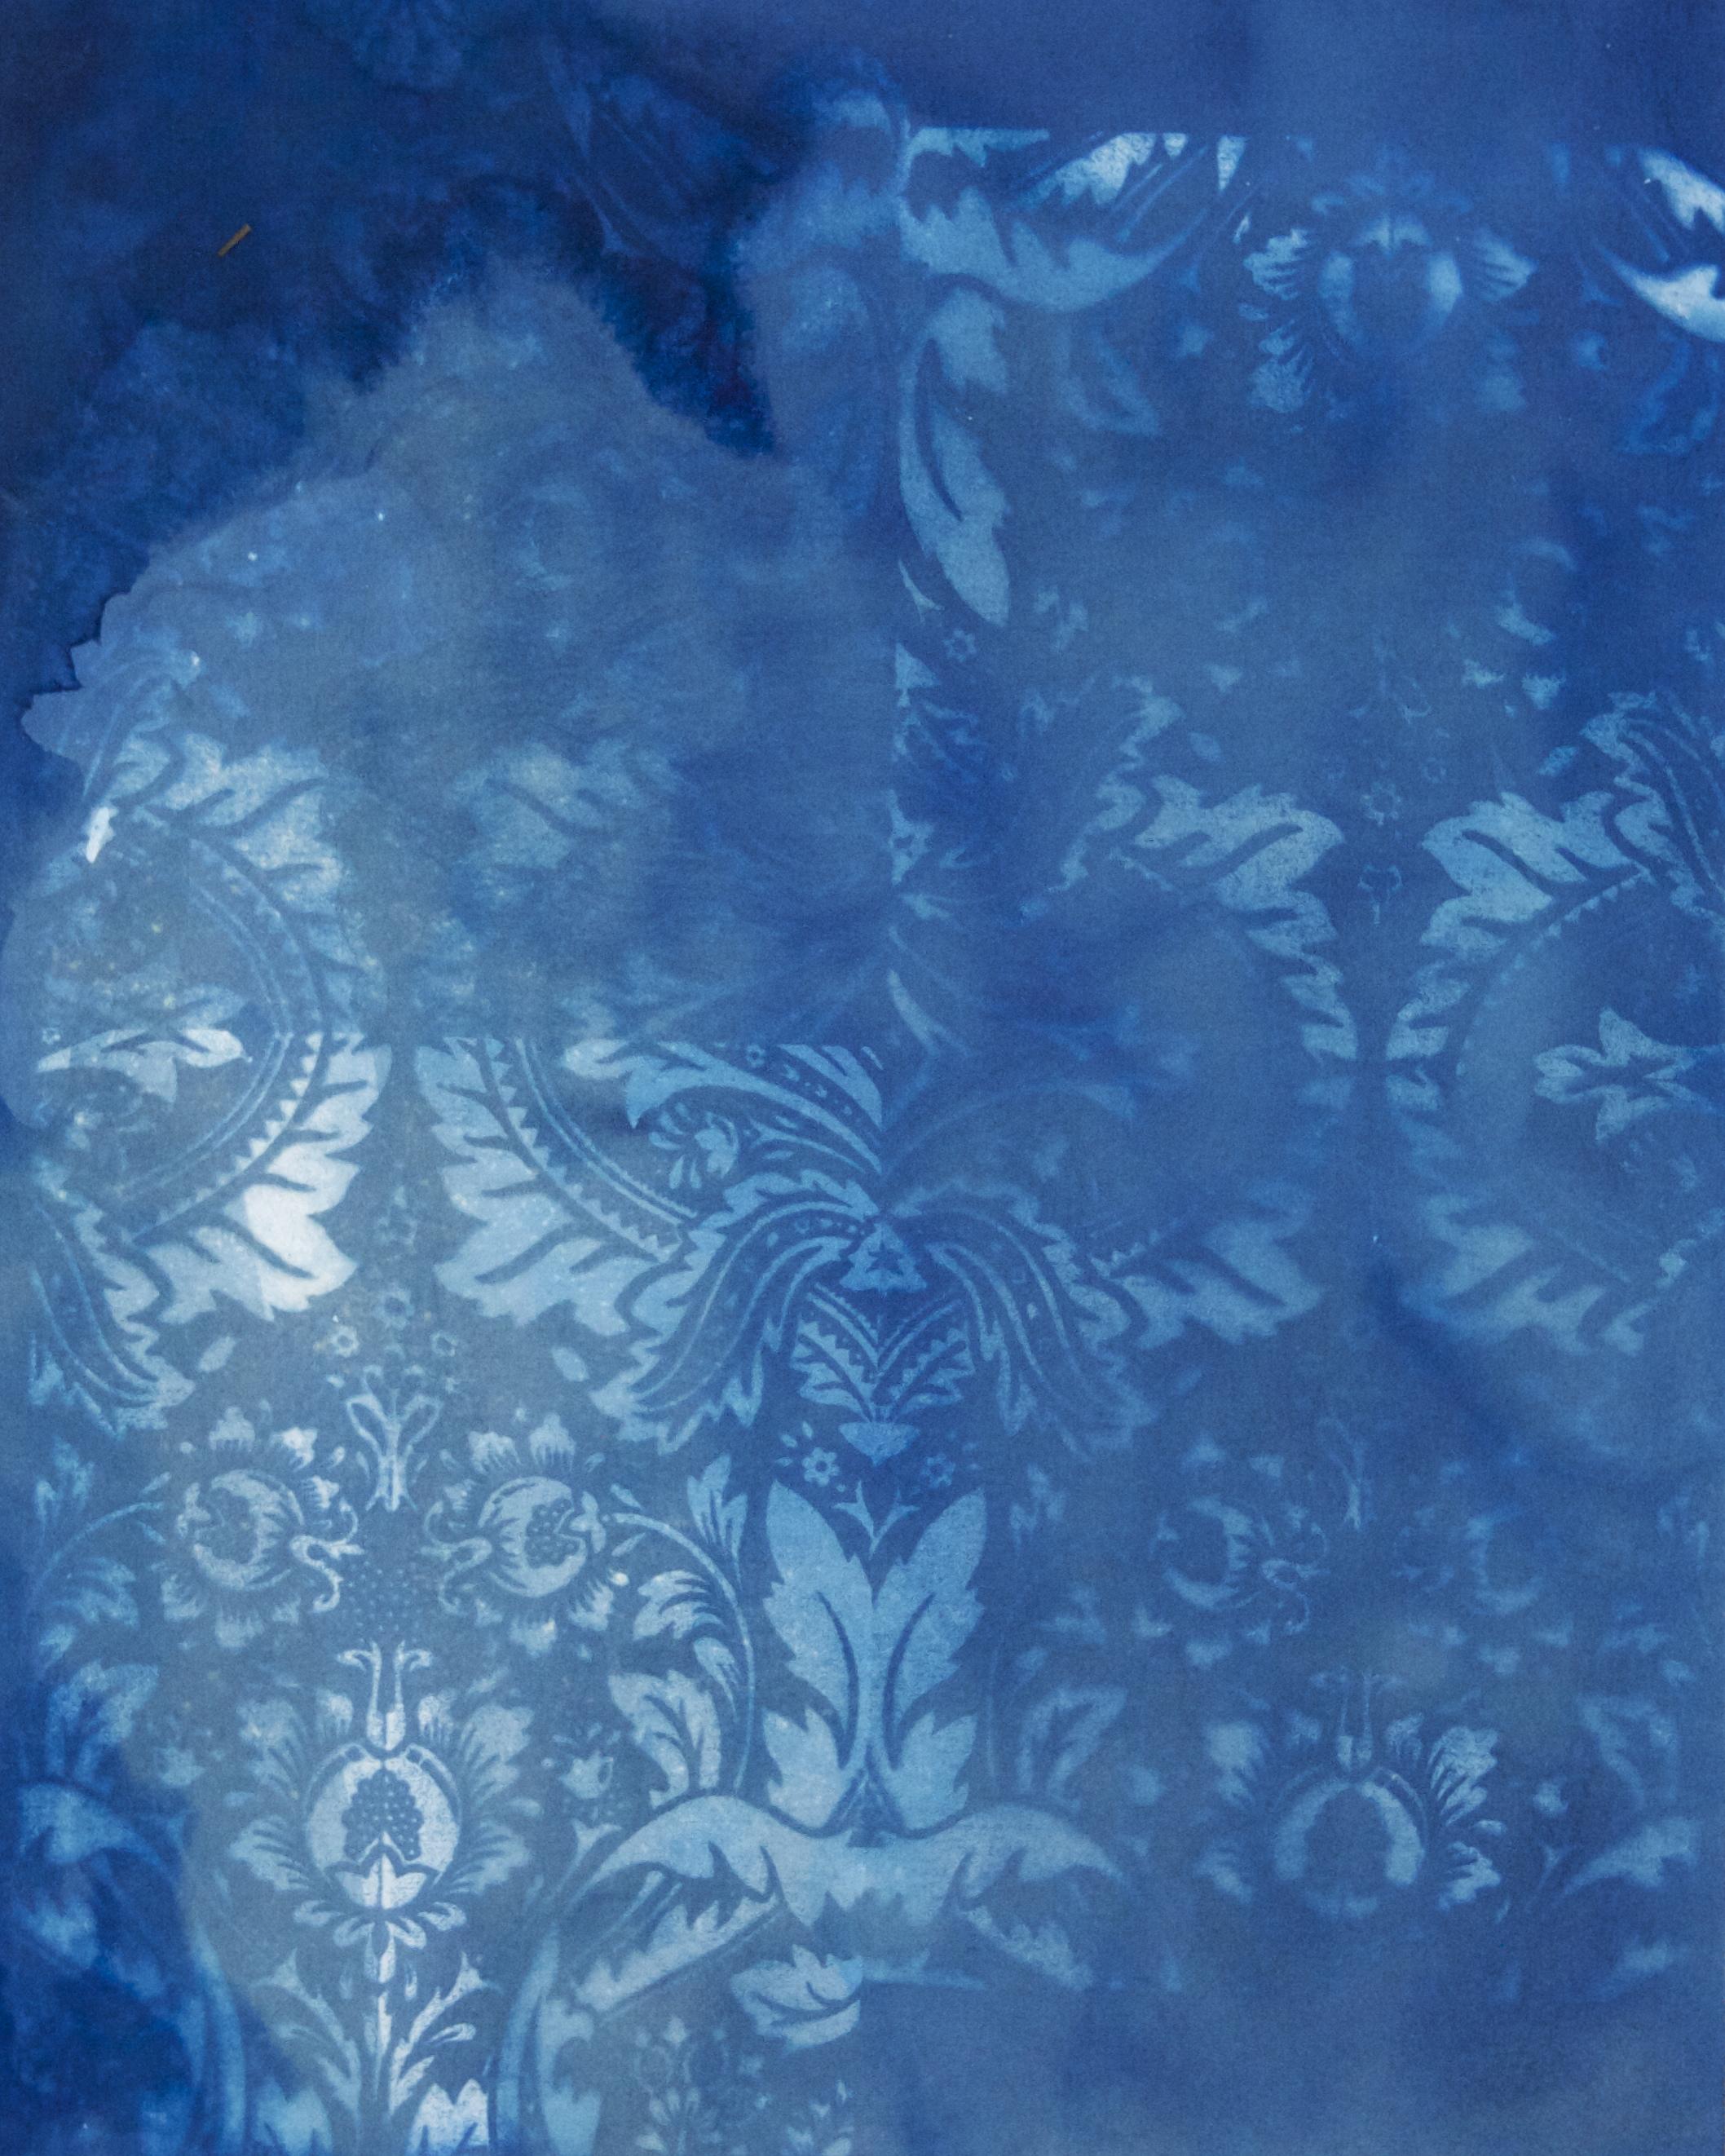 fading blue print